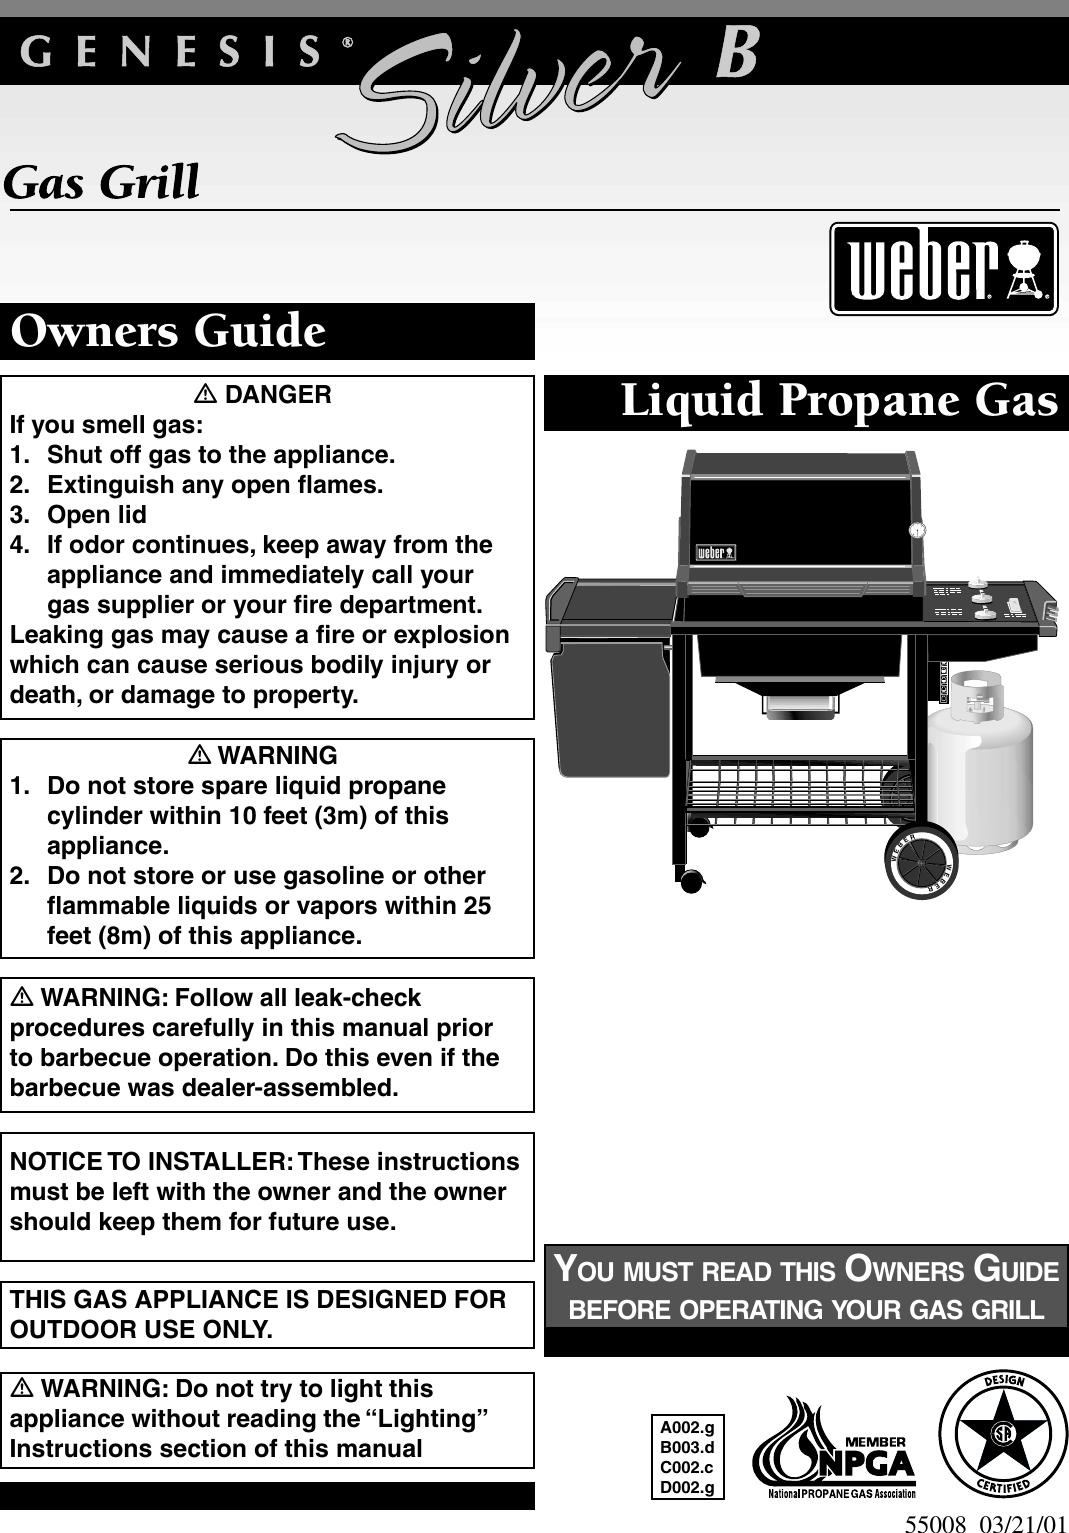 Weber 55008 Owners Manual Genesis Silver B Lp Guide 03 21 2001 Pdf File